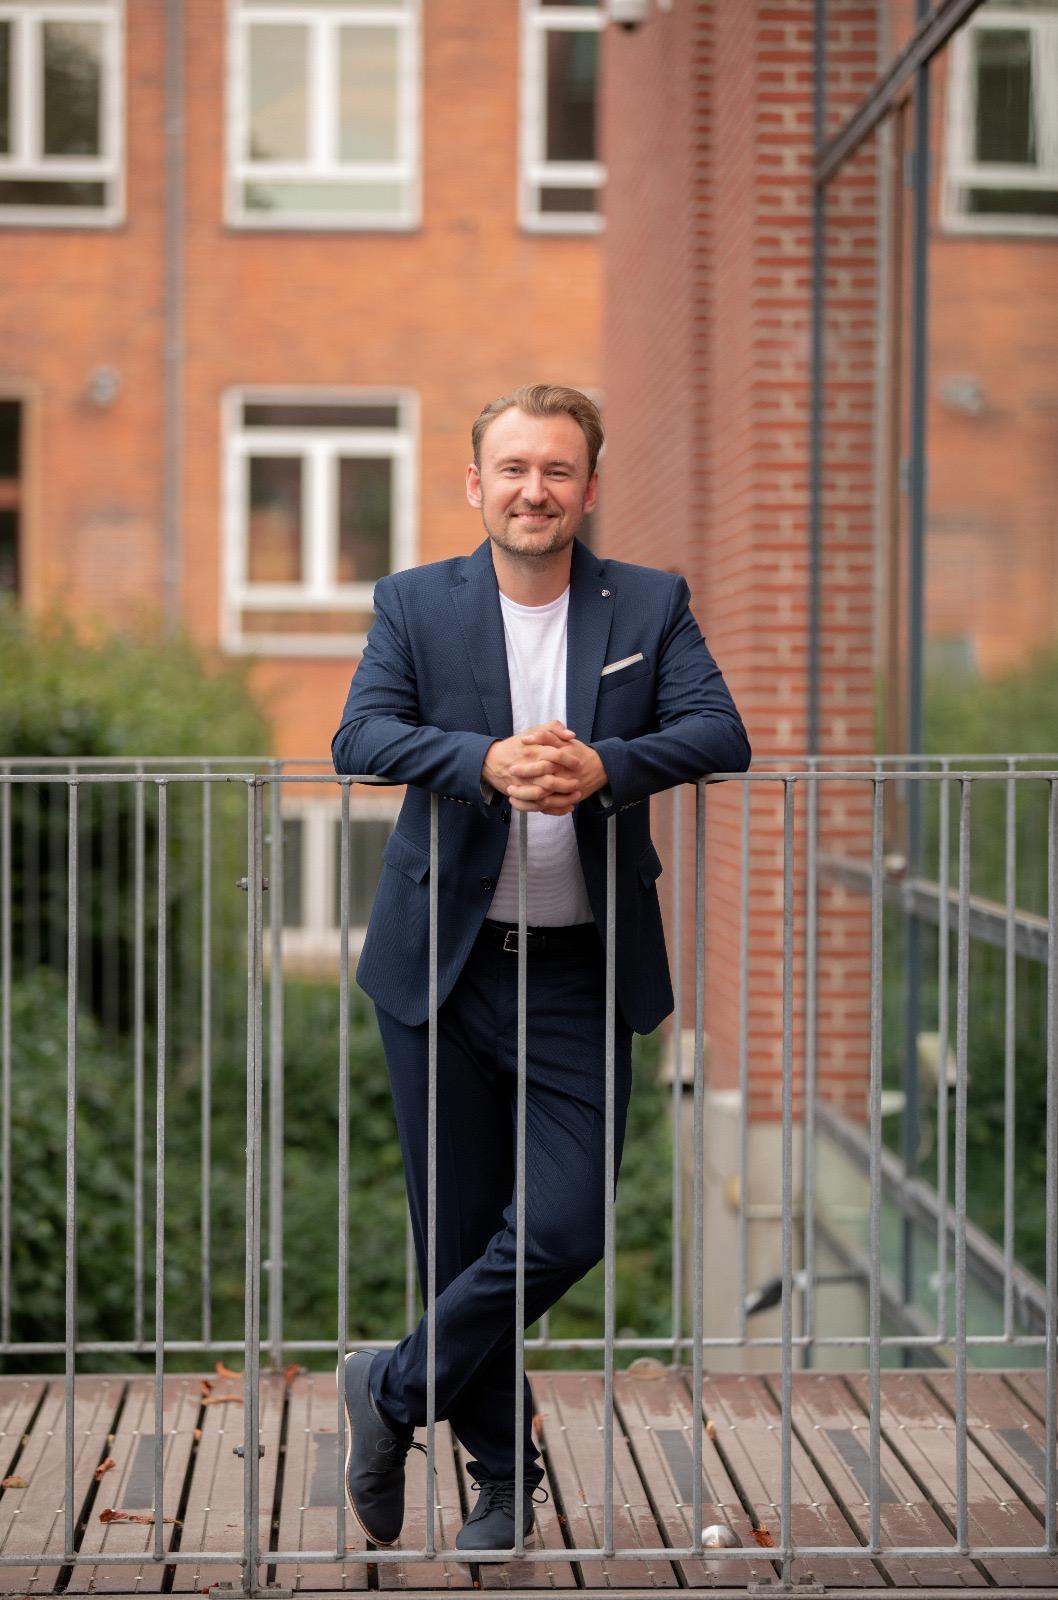 Steven Højlund